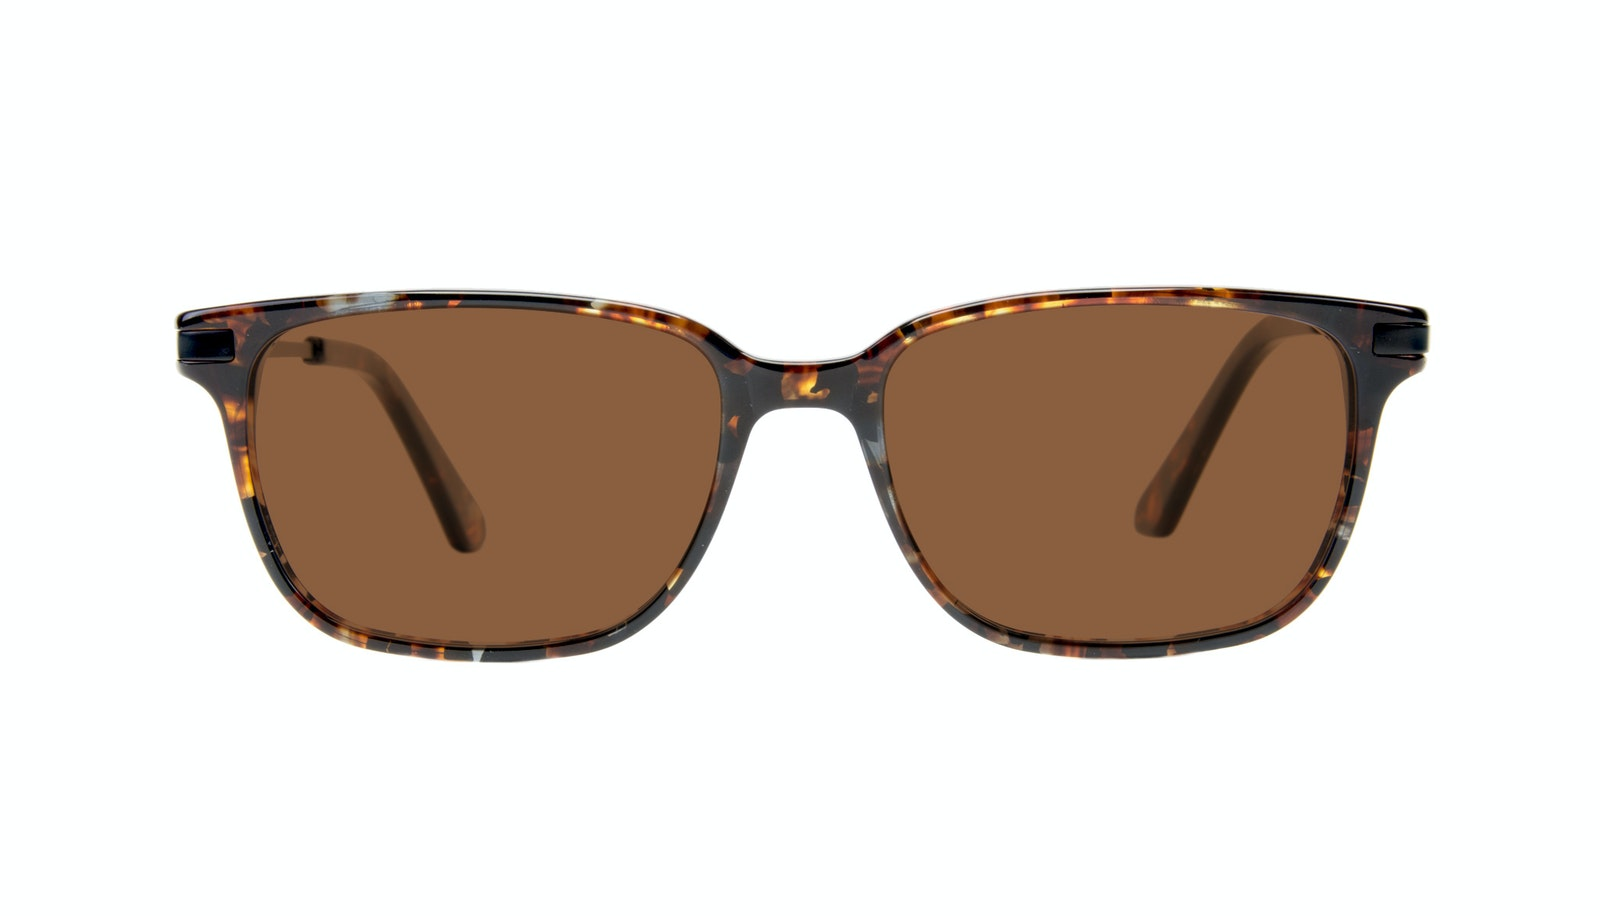 Affordable Fashion Glasses Rectangle Sunglasses Men Trade Mahogany